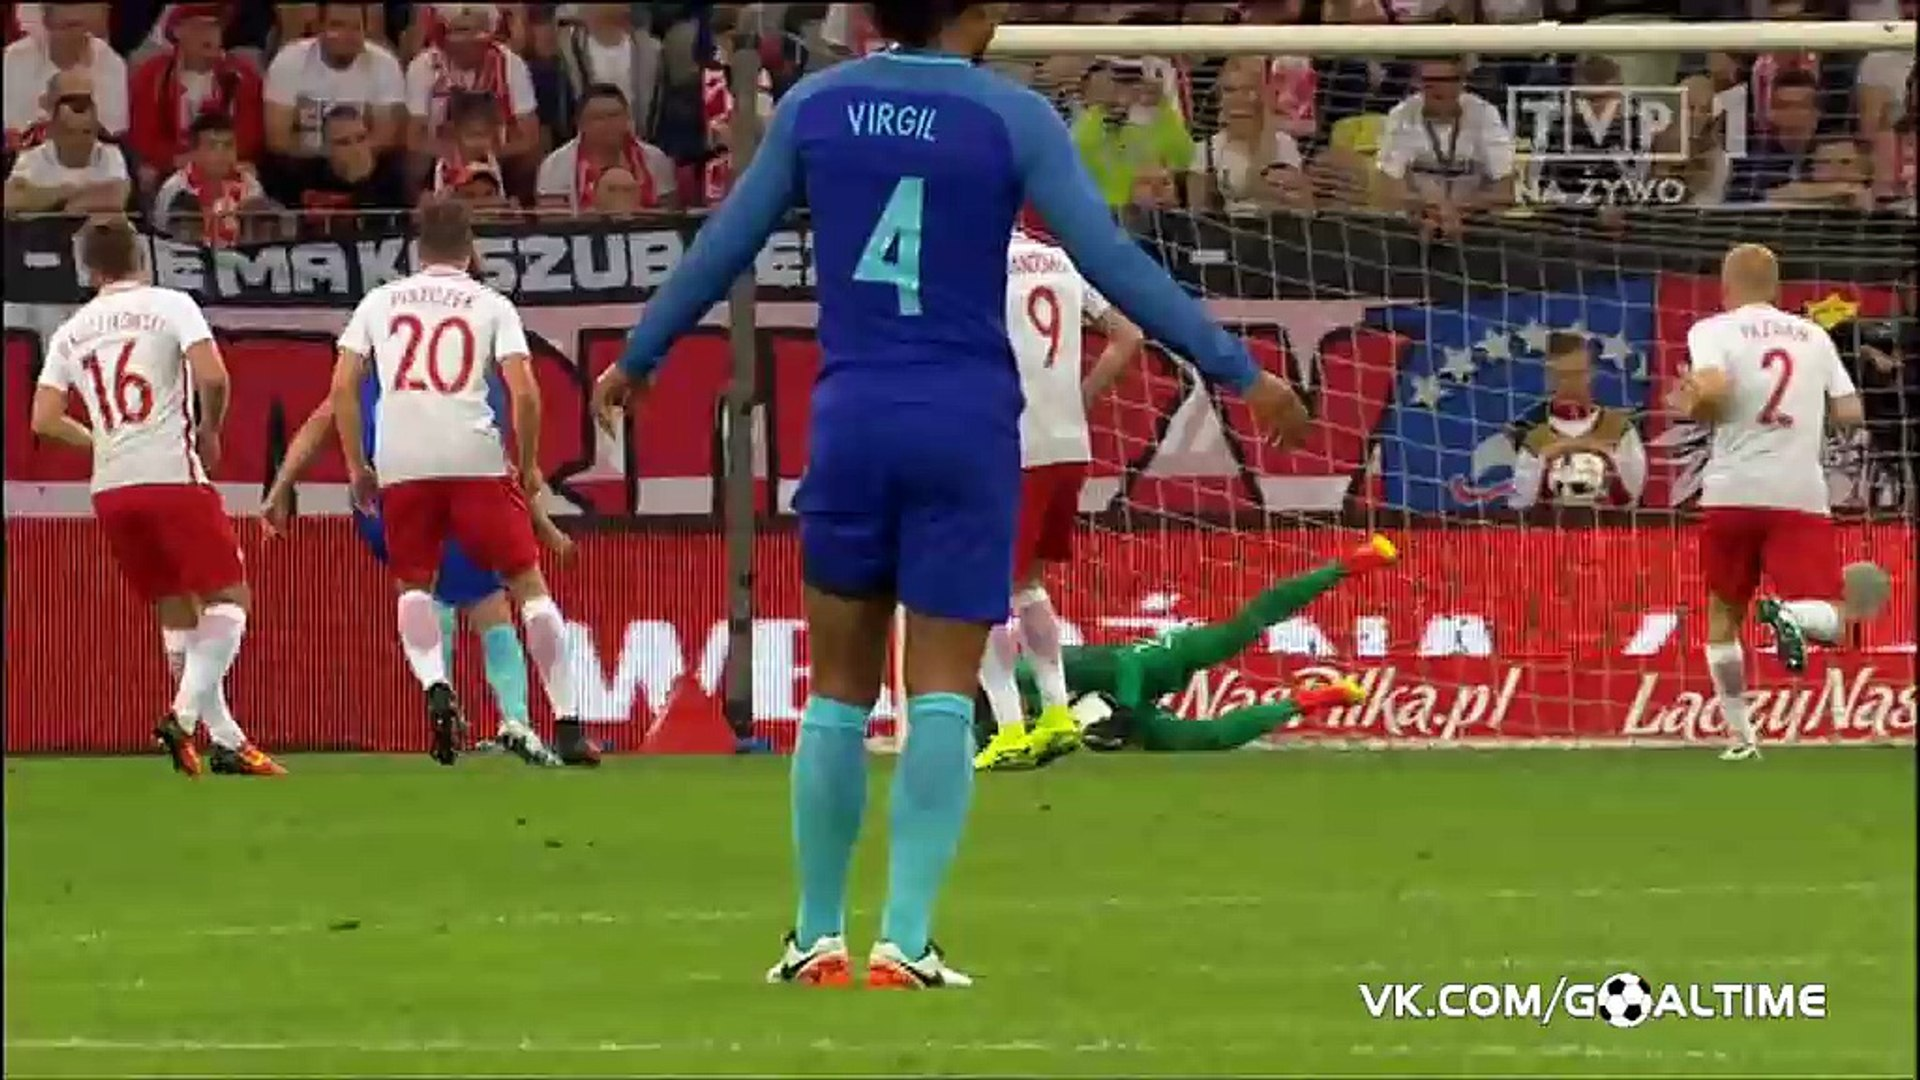 Poland 1-2 Netherlands -All Goals & Extended Highlights HD-01-06-2016